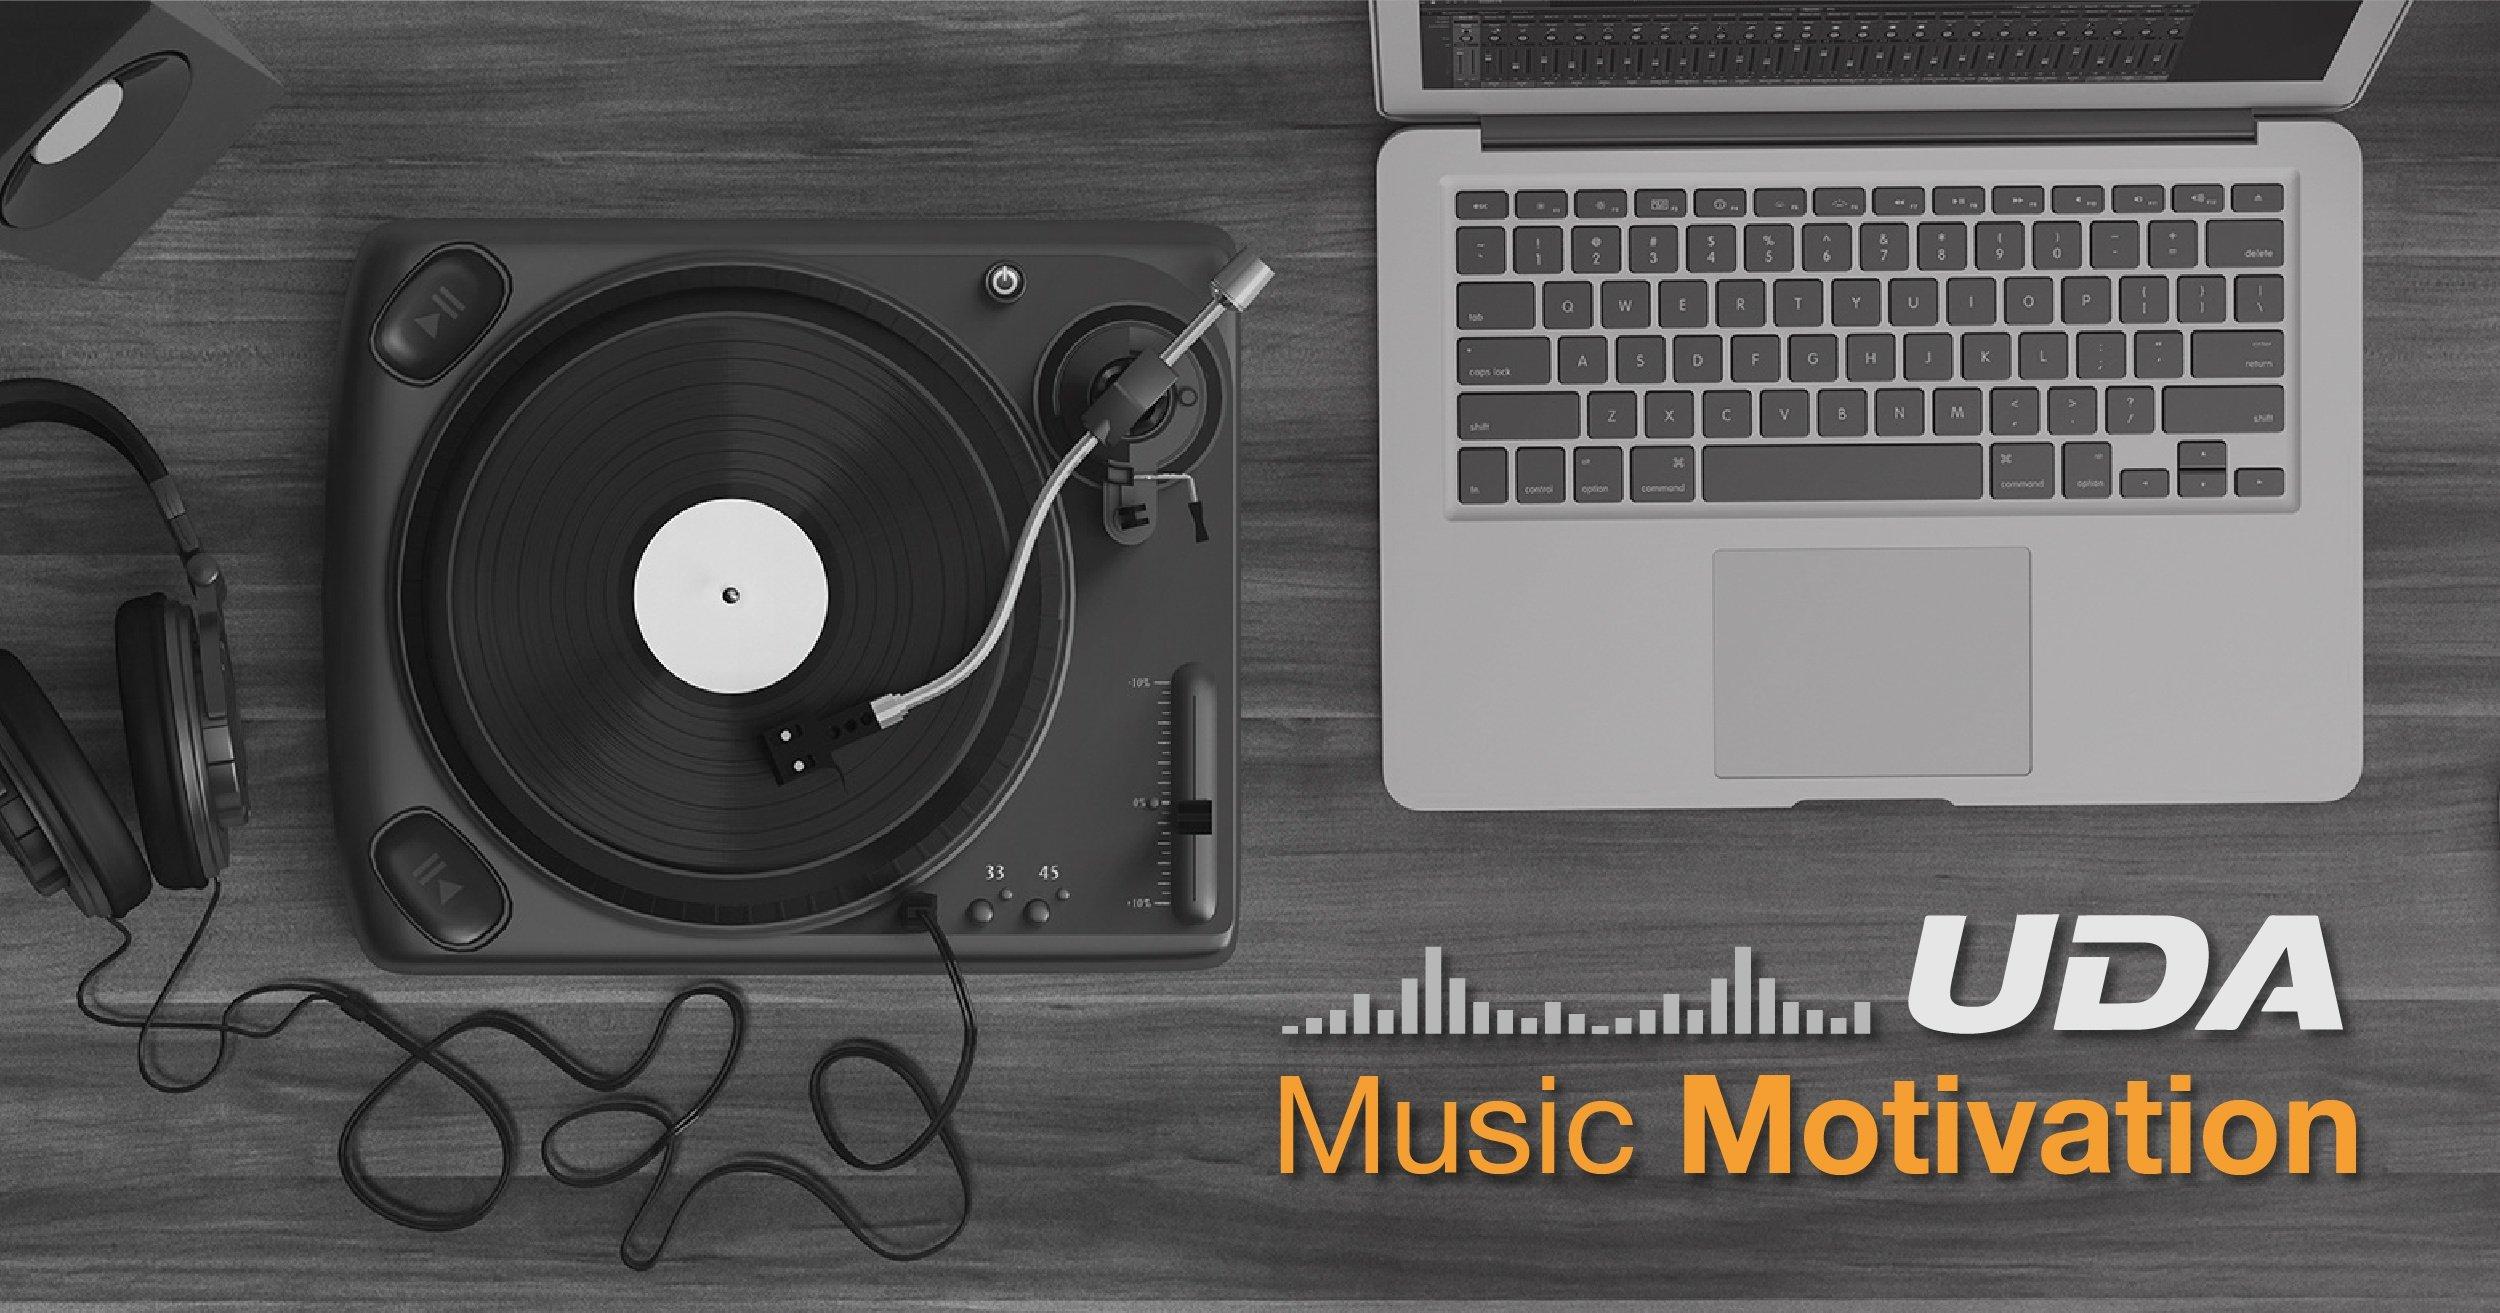 Music Motivation: Reinventing the Wheel